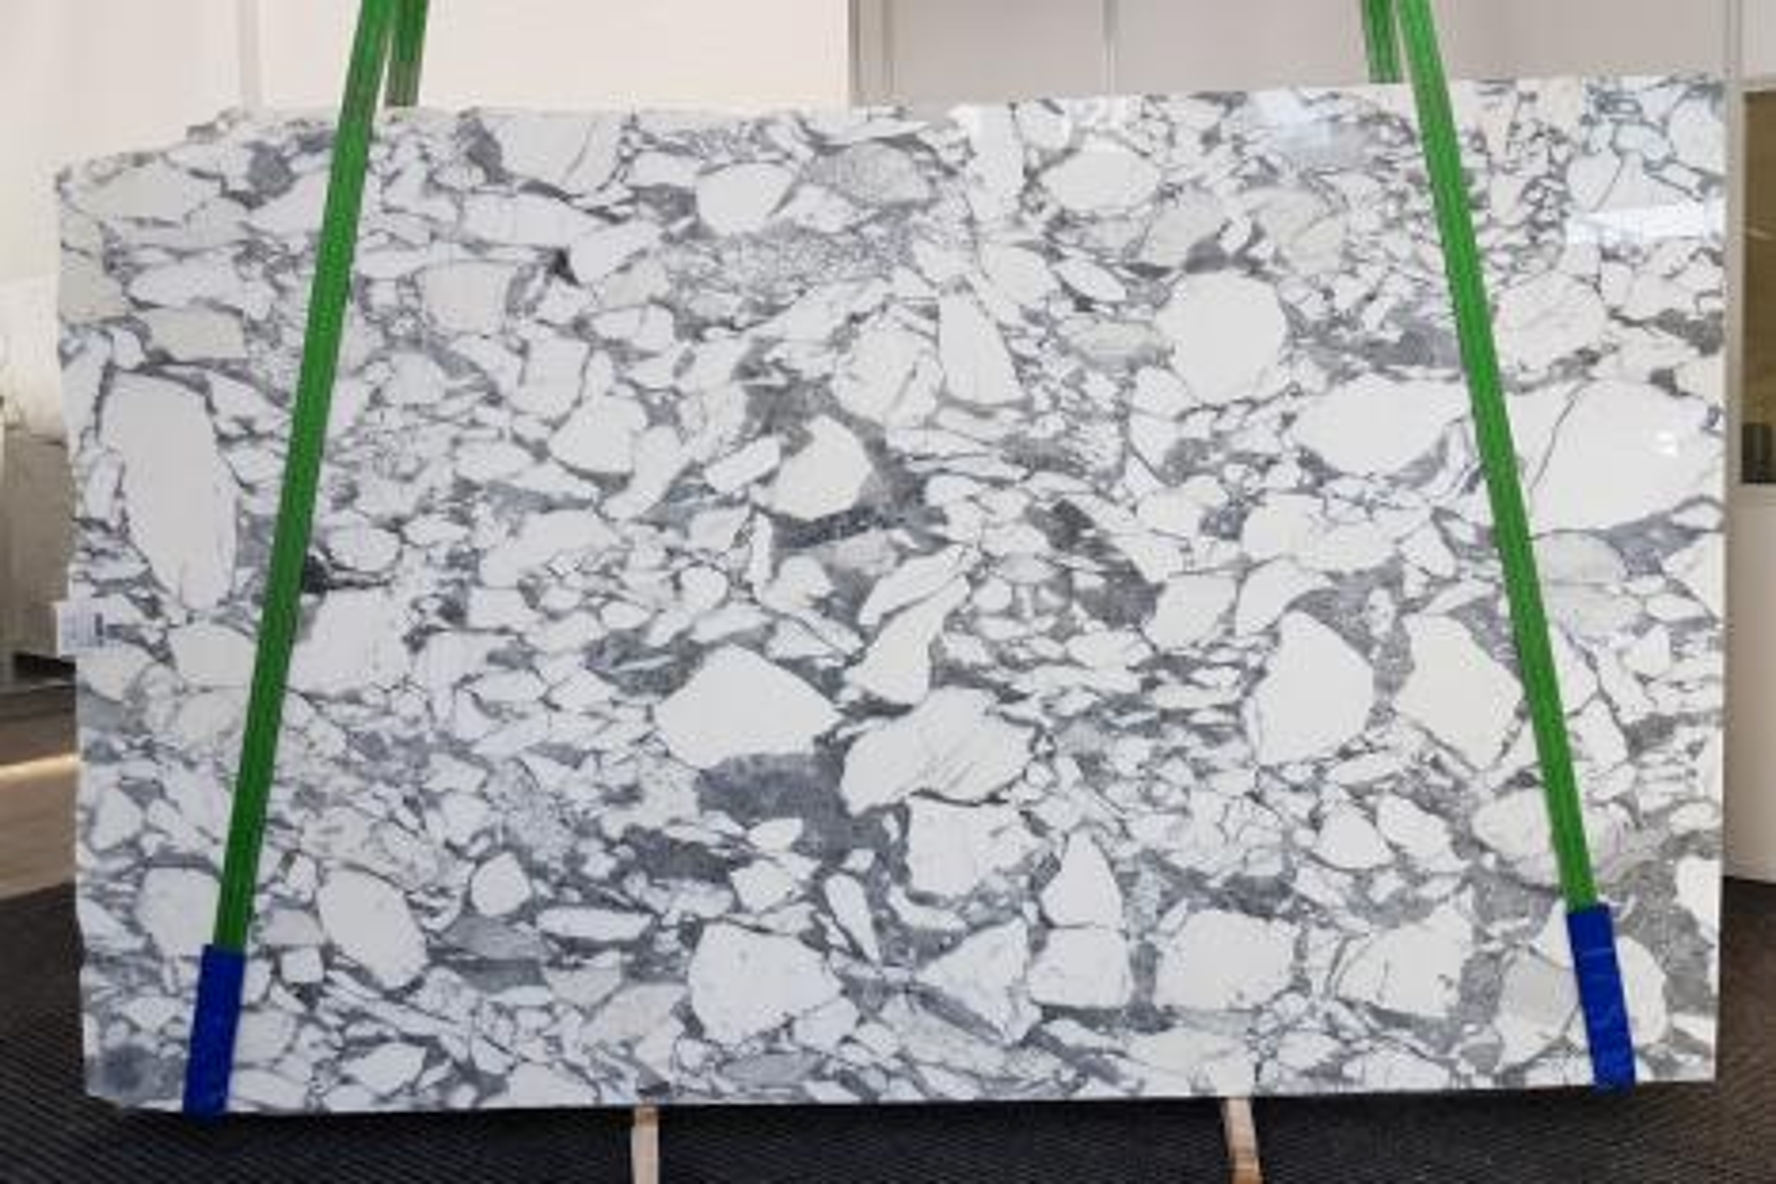 ARABESCATO CORCHIA Fourniture (Italie) d' dalles brillantes en marbre naturel 1031 , Slab #09